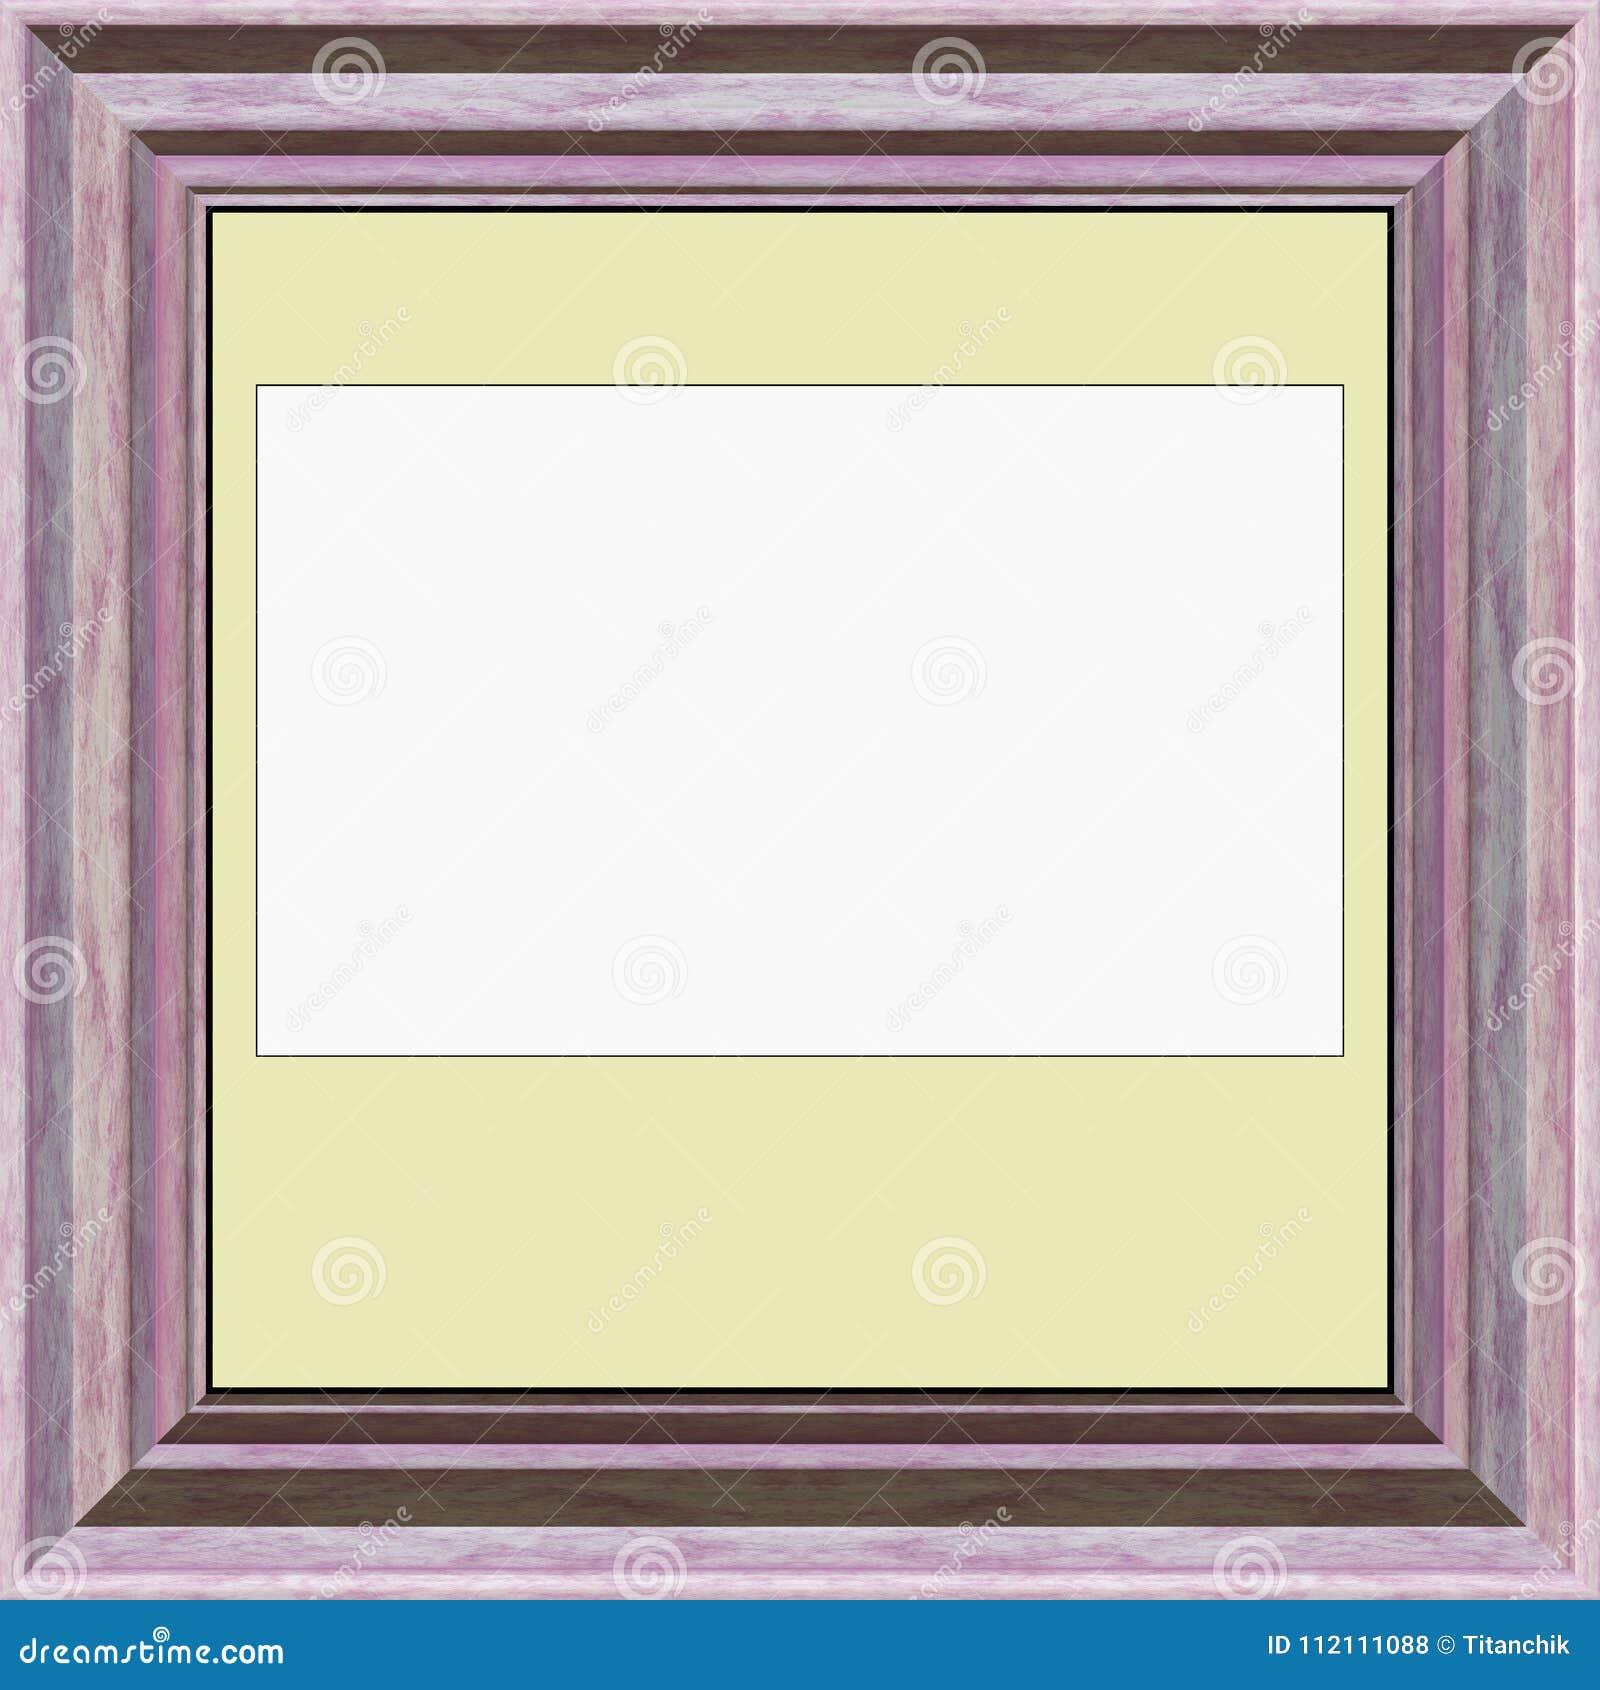 Decor Room- Blank Picture Frame Stock Illustration - Illustration of ...